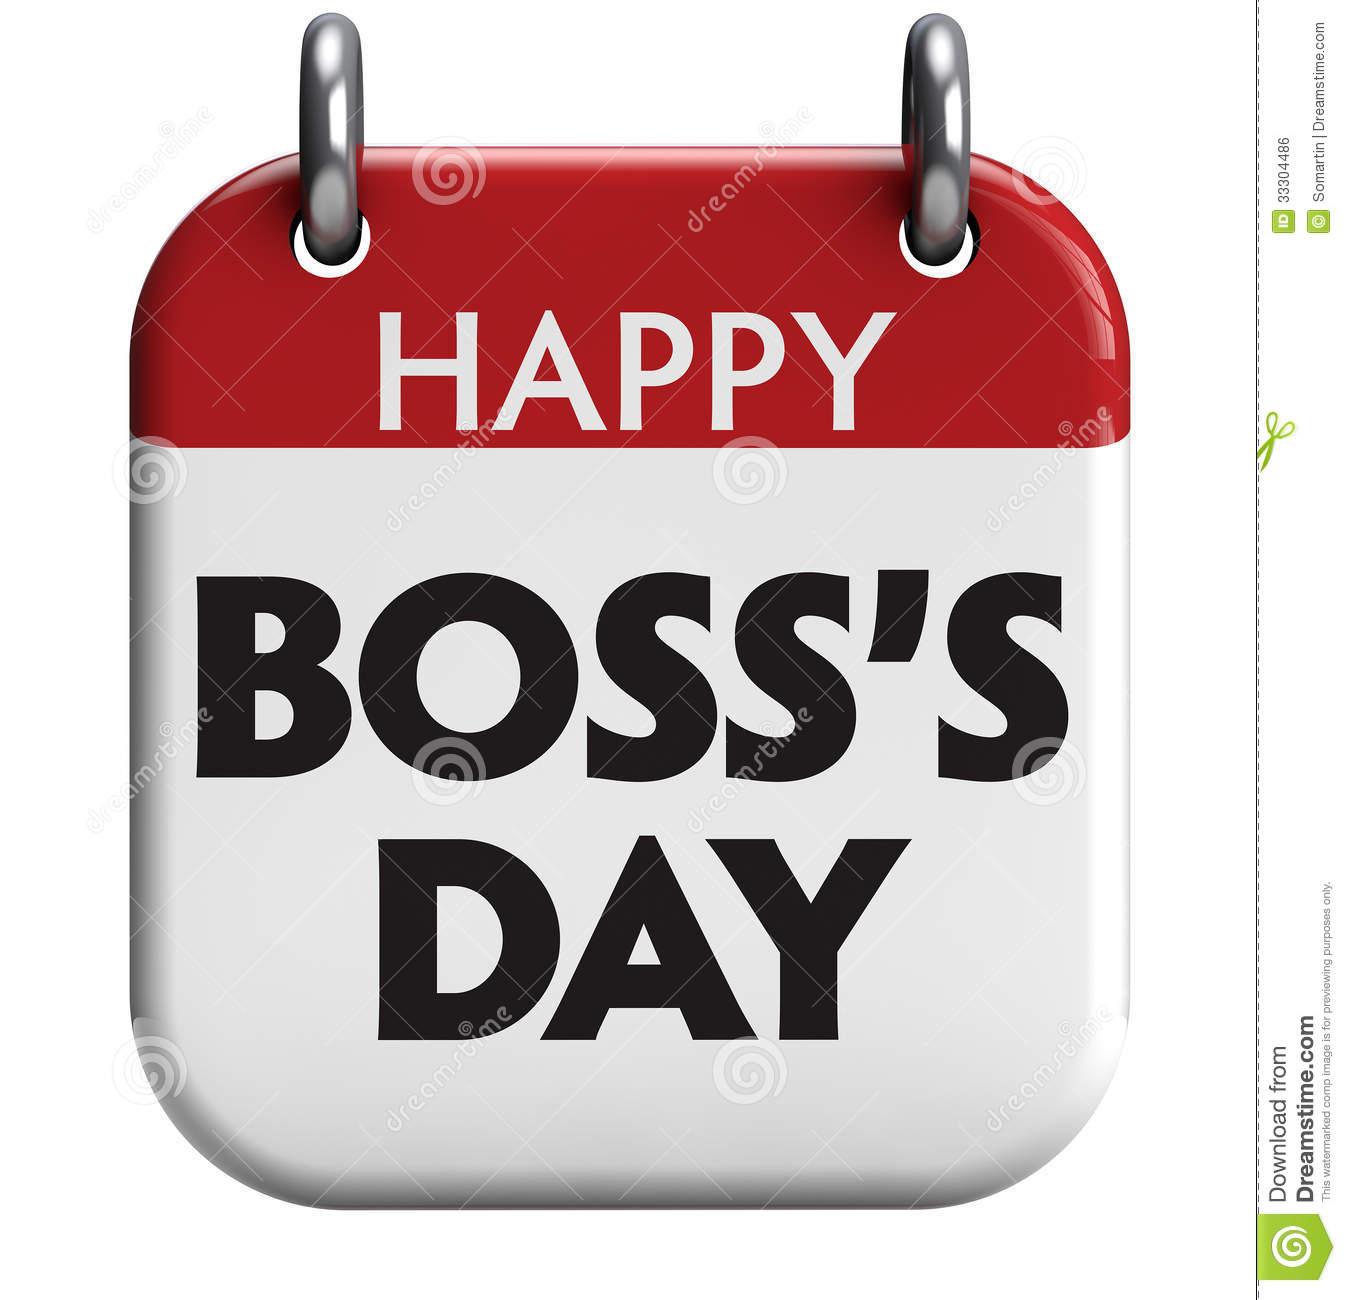 Happy Bosss Day Clip Art Free Happy Boss-Happy Bosss Day Clip Art Free Happy Bosses Day Printable Card View-4